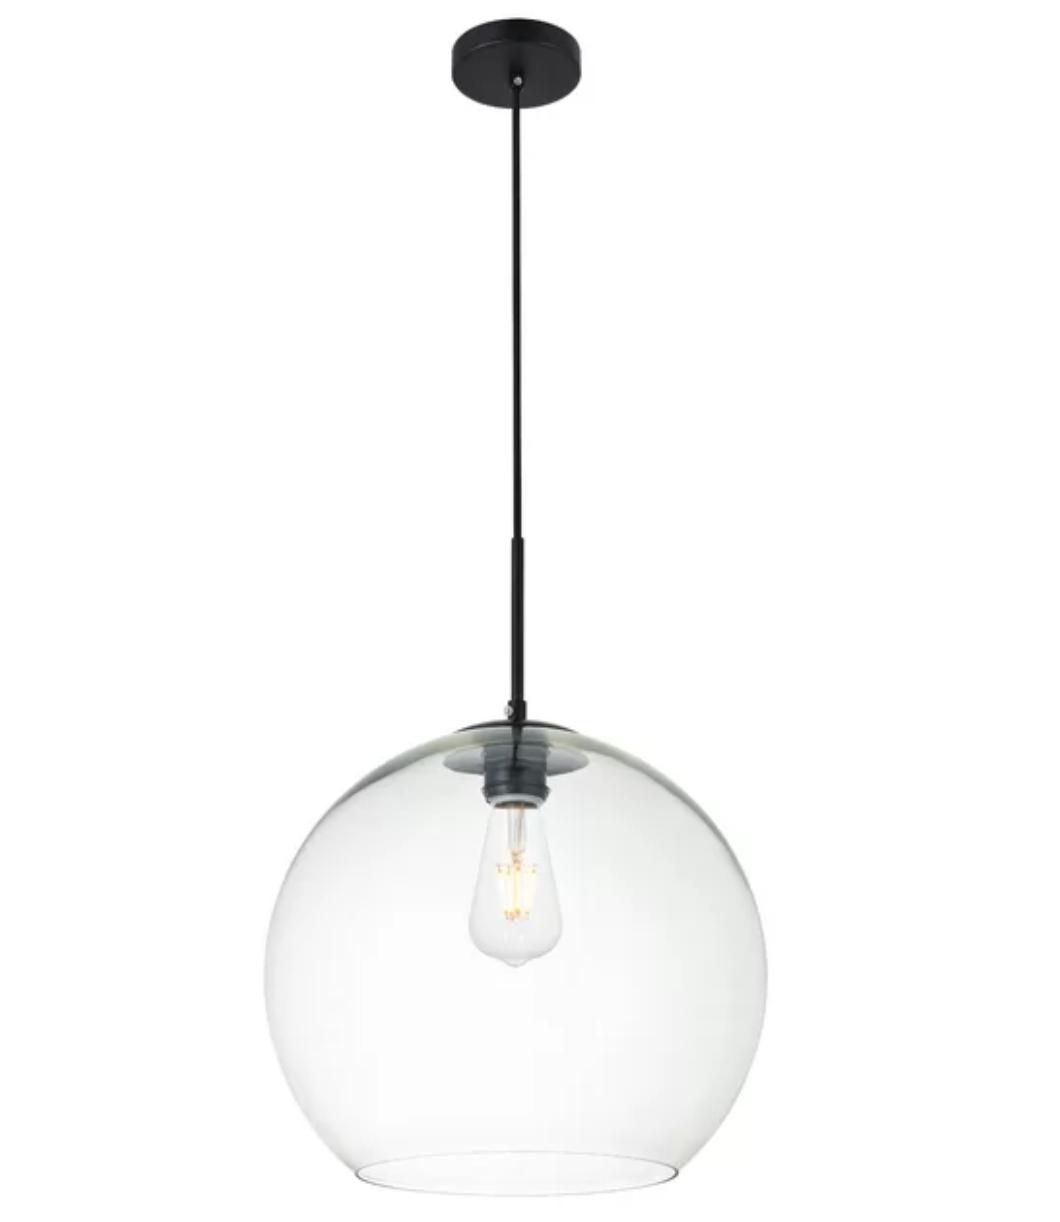 Round Globe Pendant Light.png